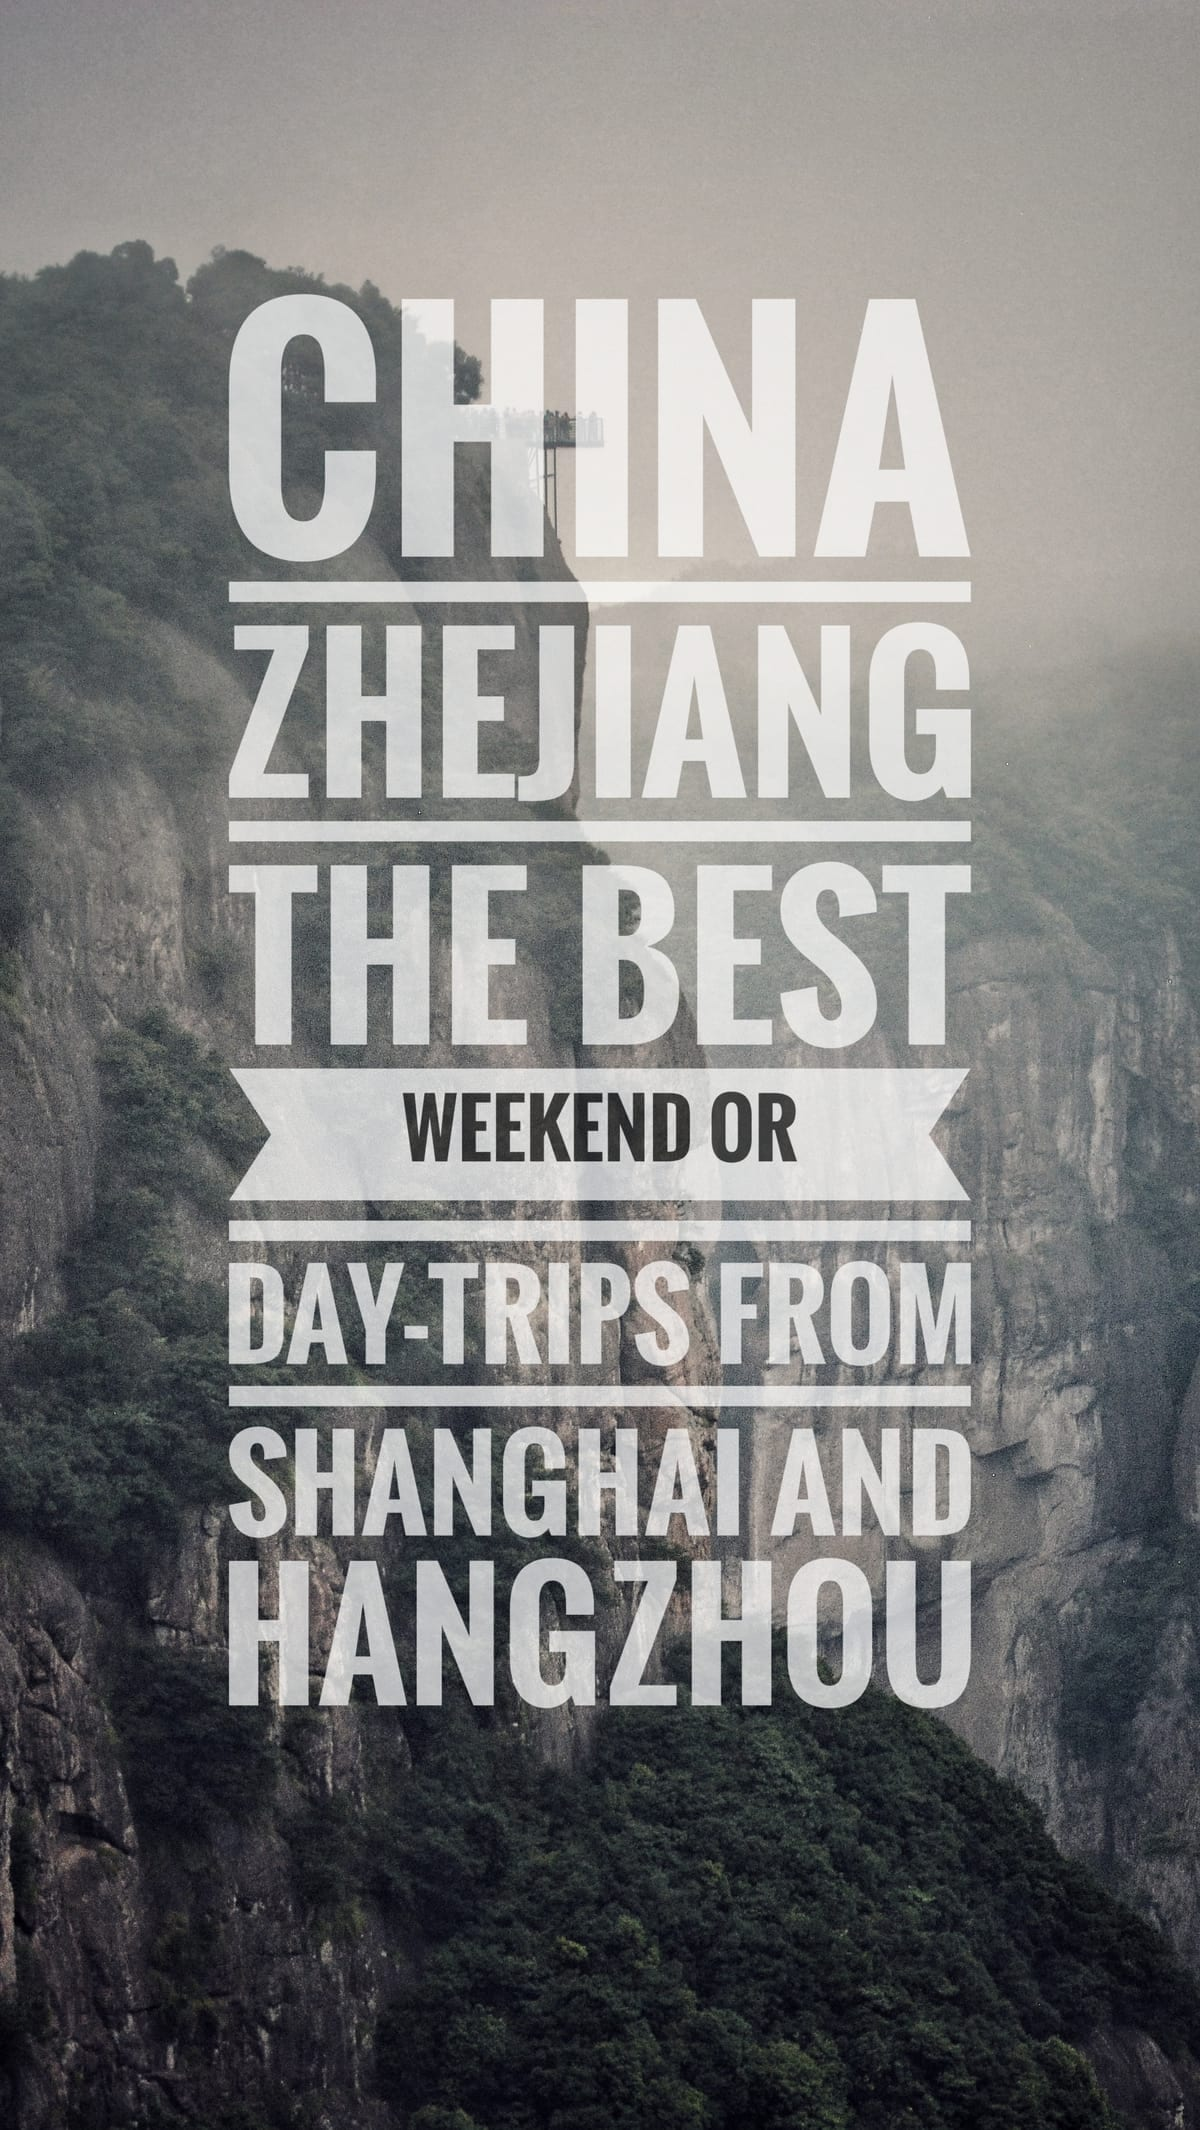 best weekend day trip shanghai hangzhou